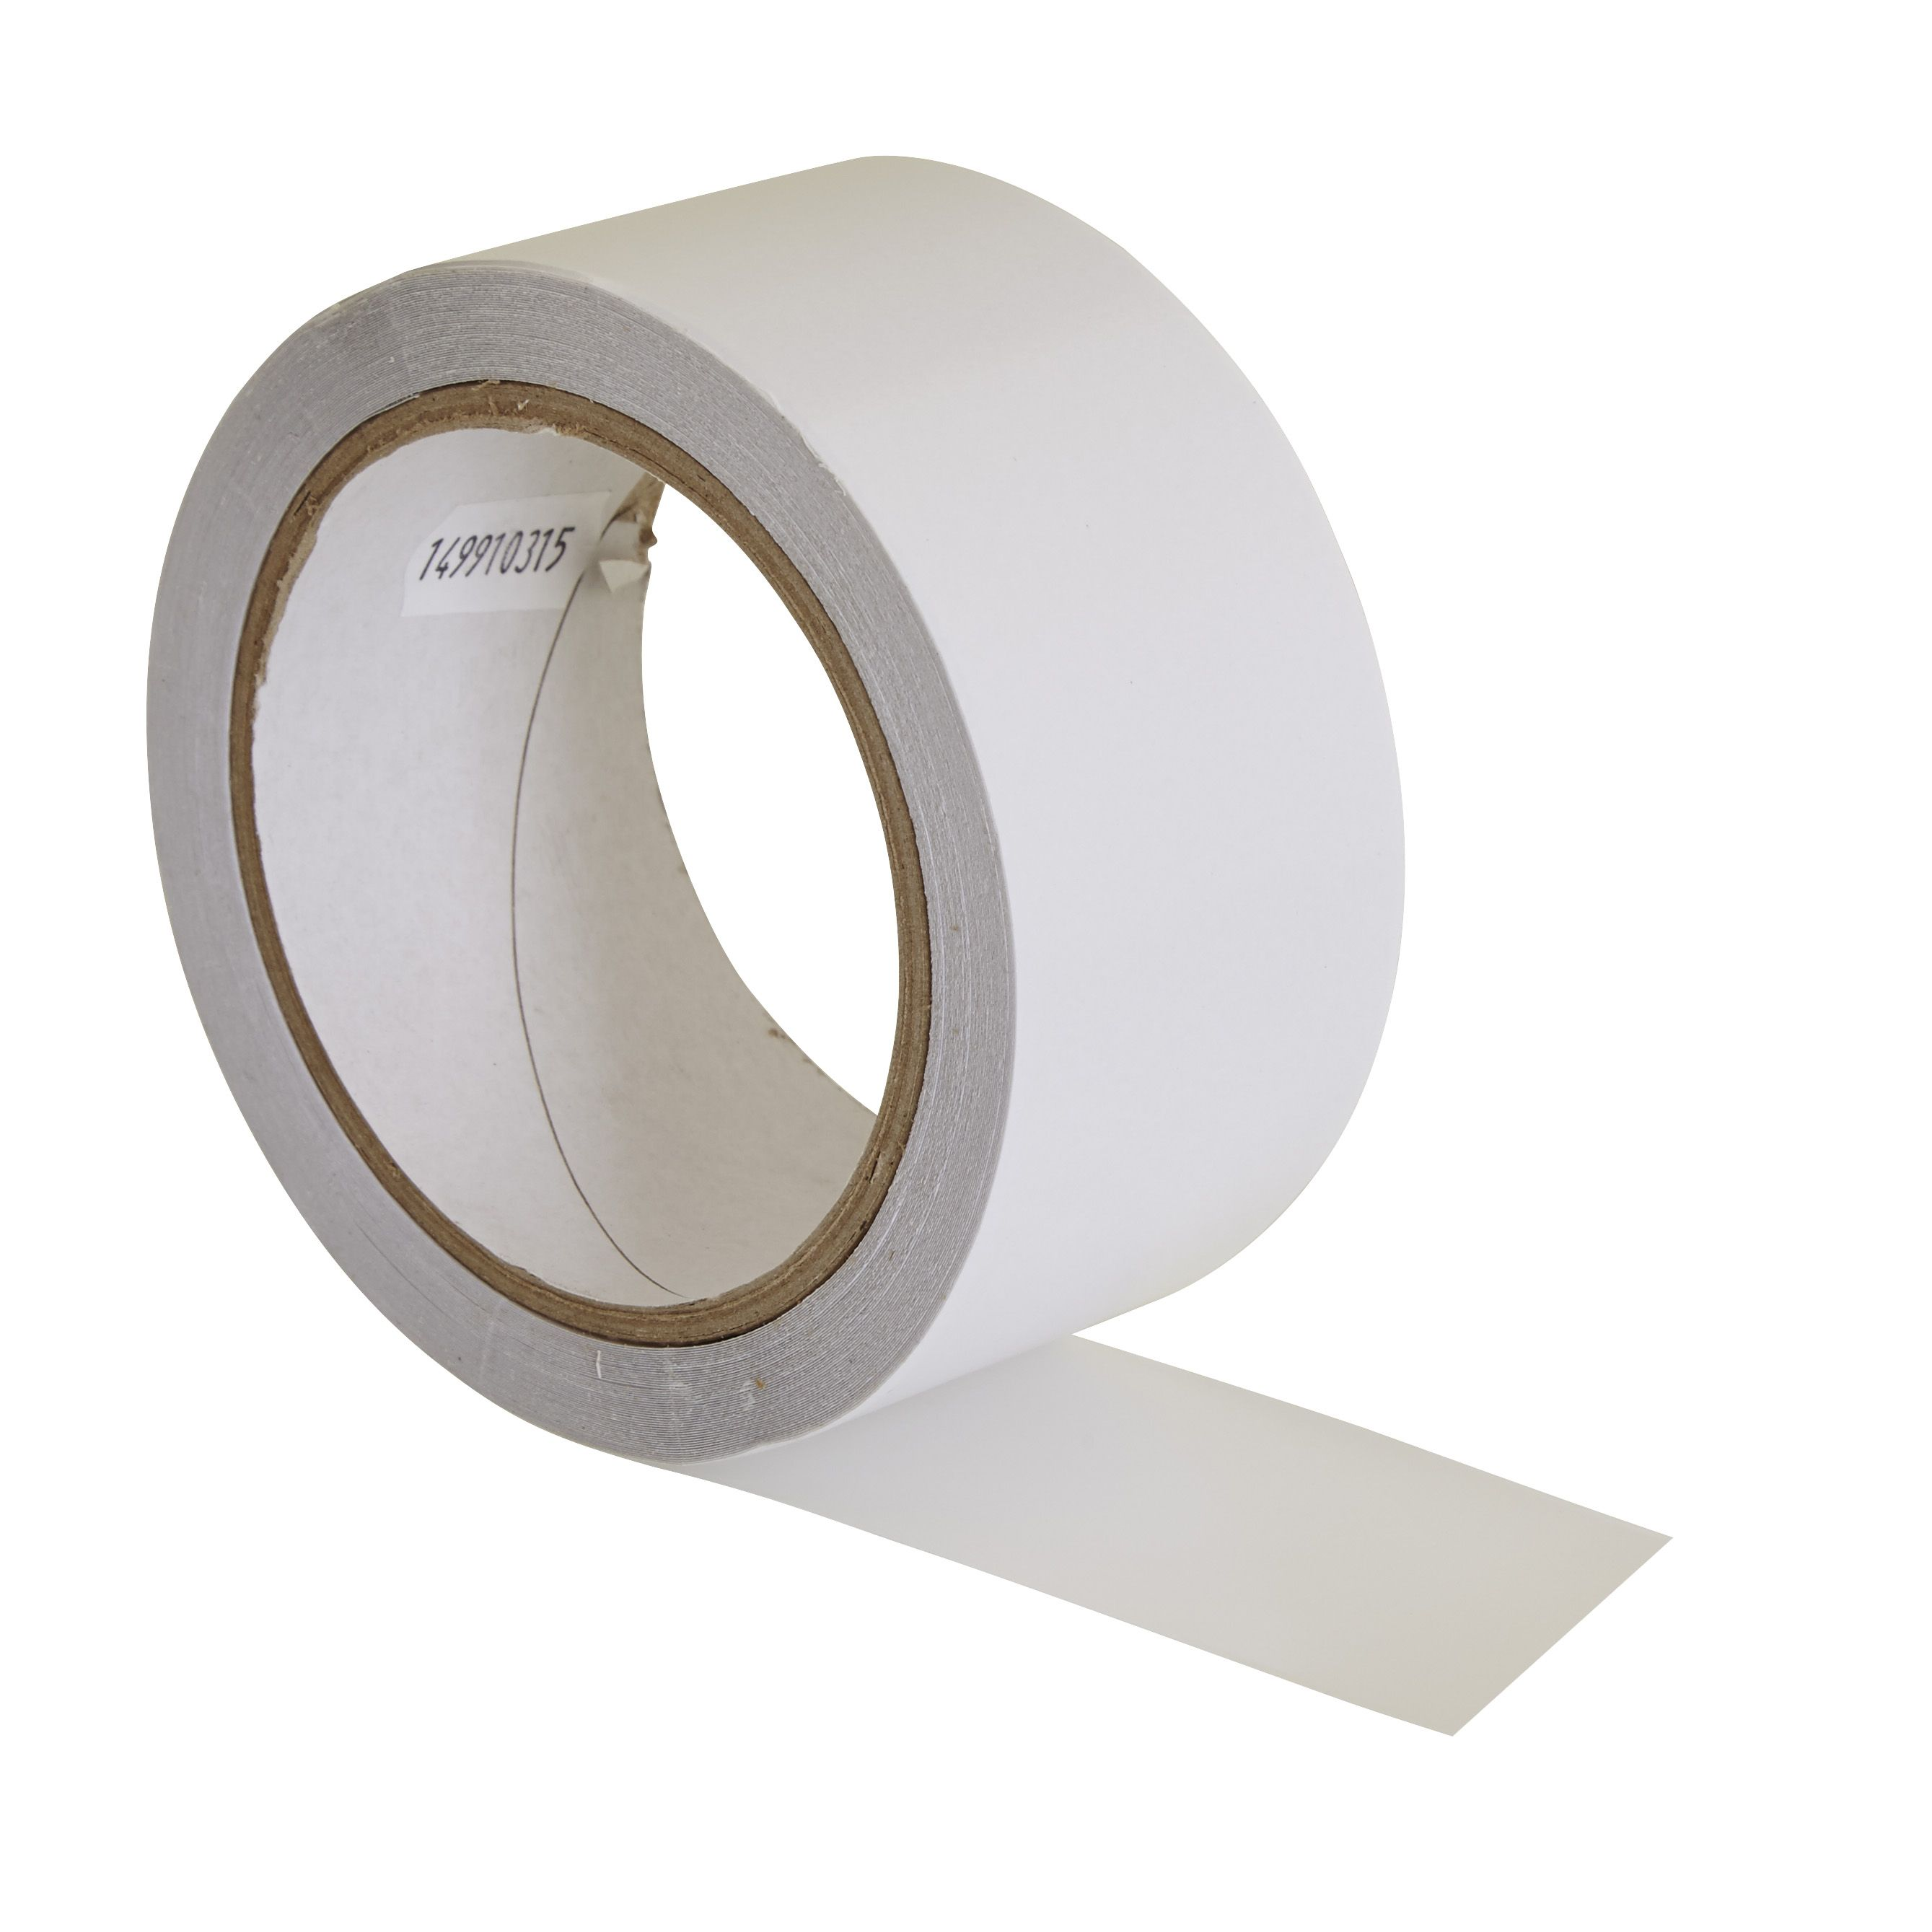 Diall White Double Sided Vinyl Flooring Tape L 15m W